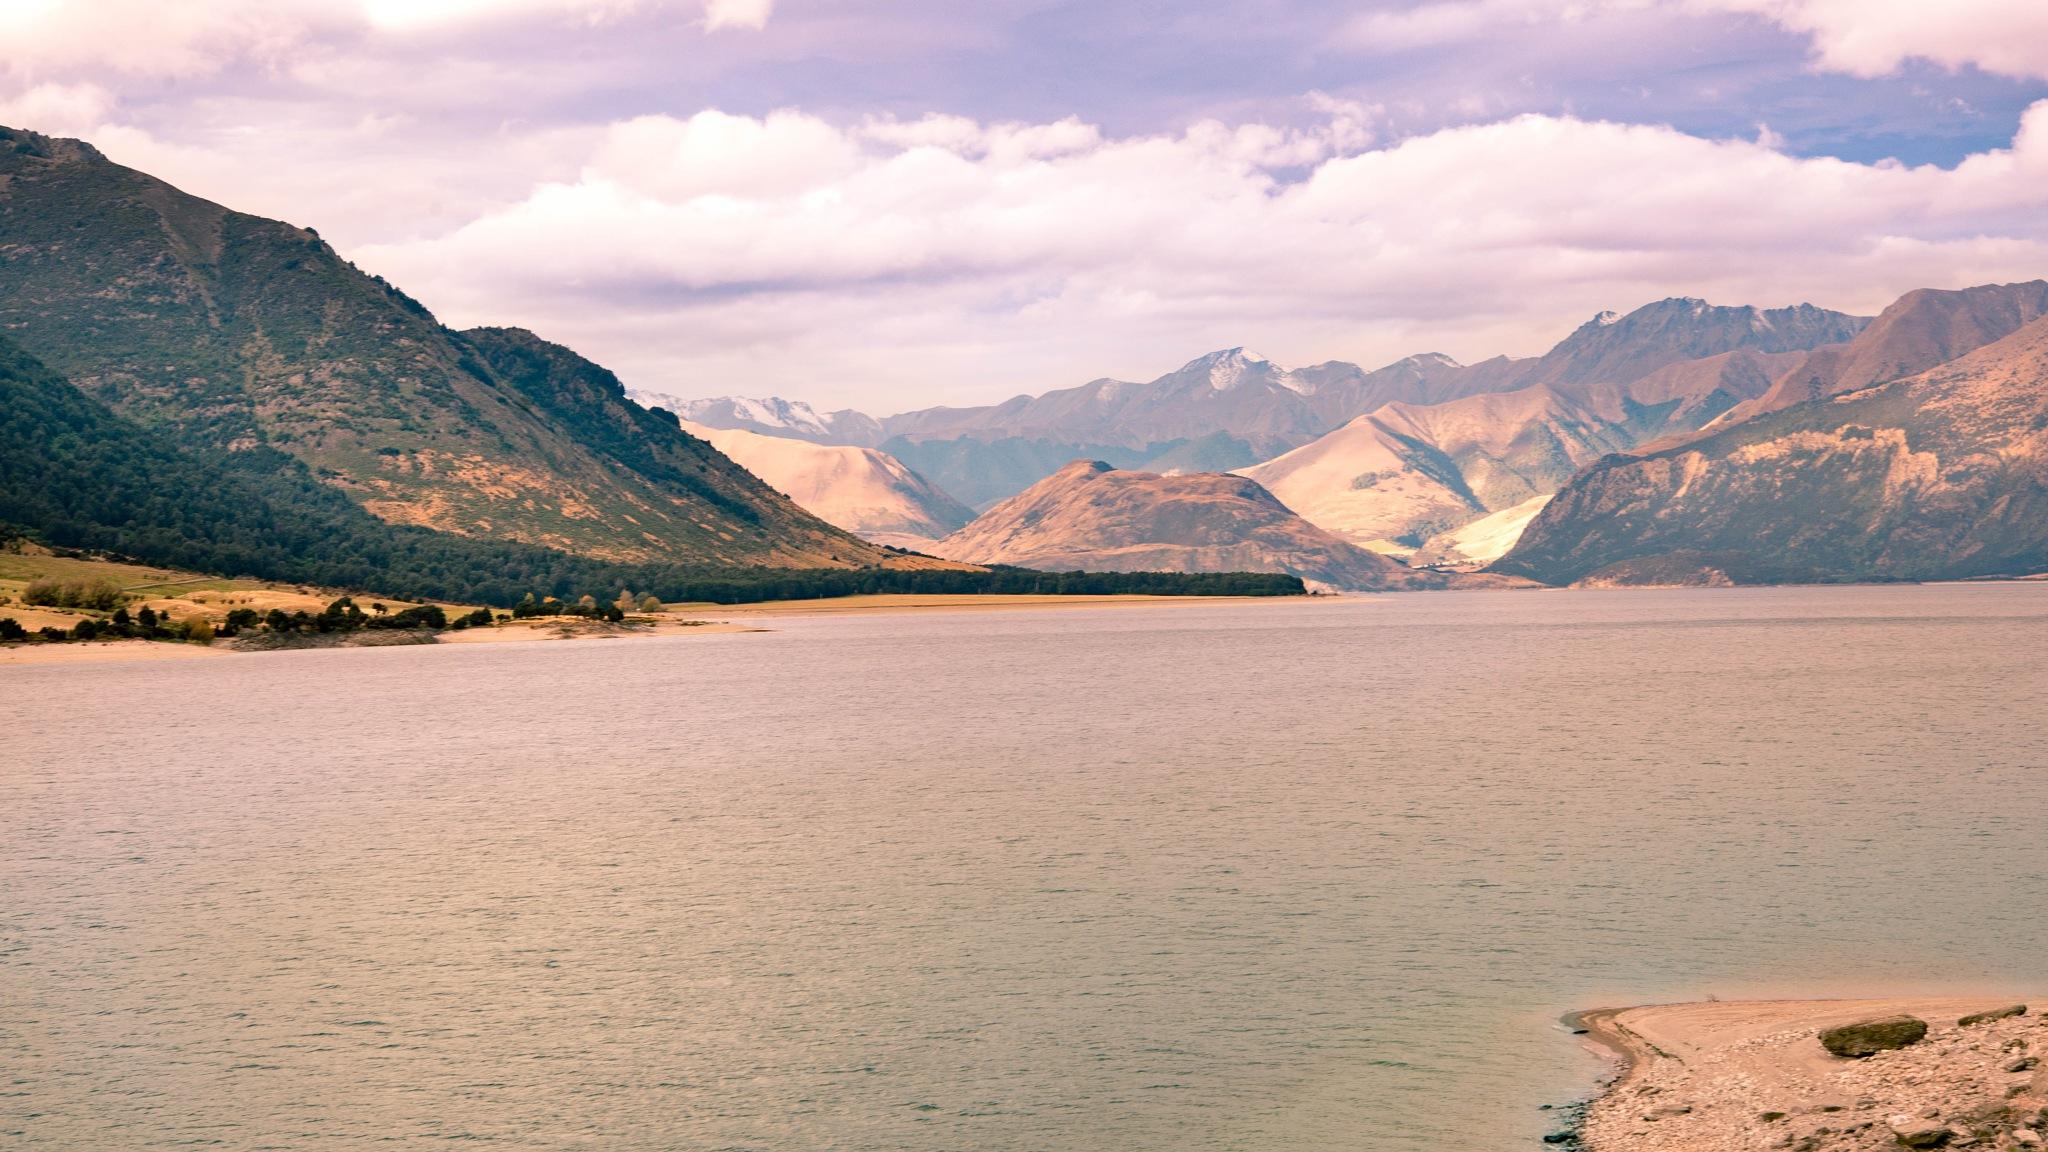 Across The Lake by Tony Buckley